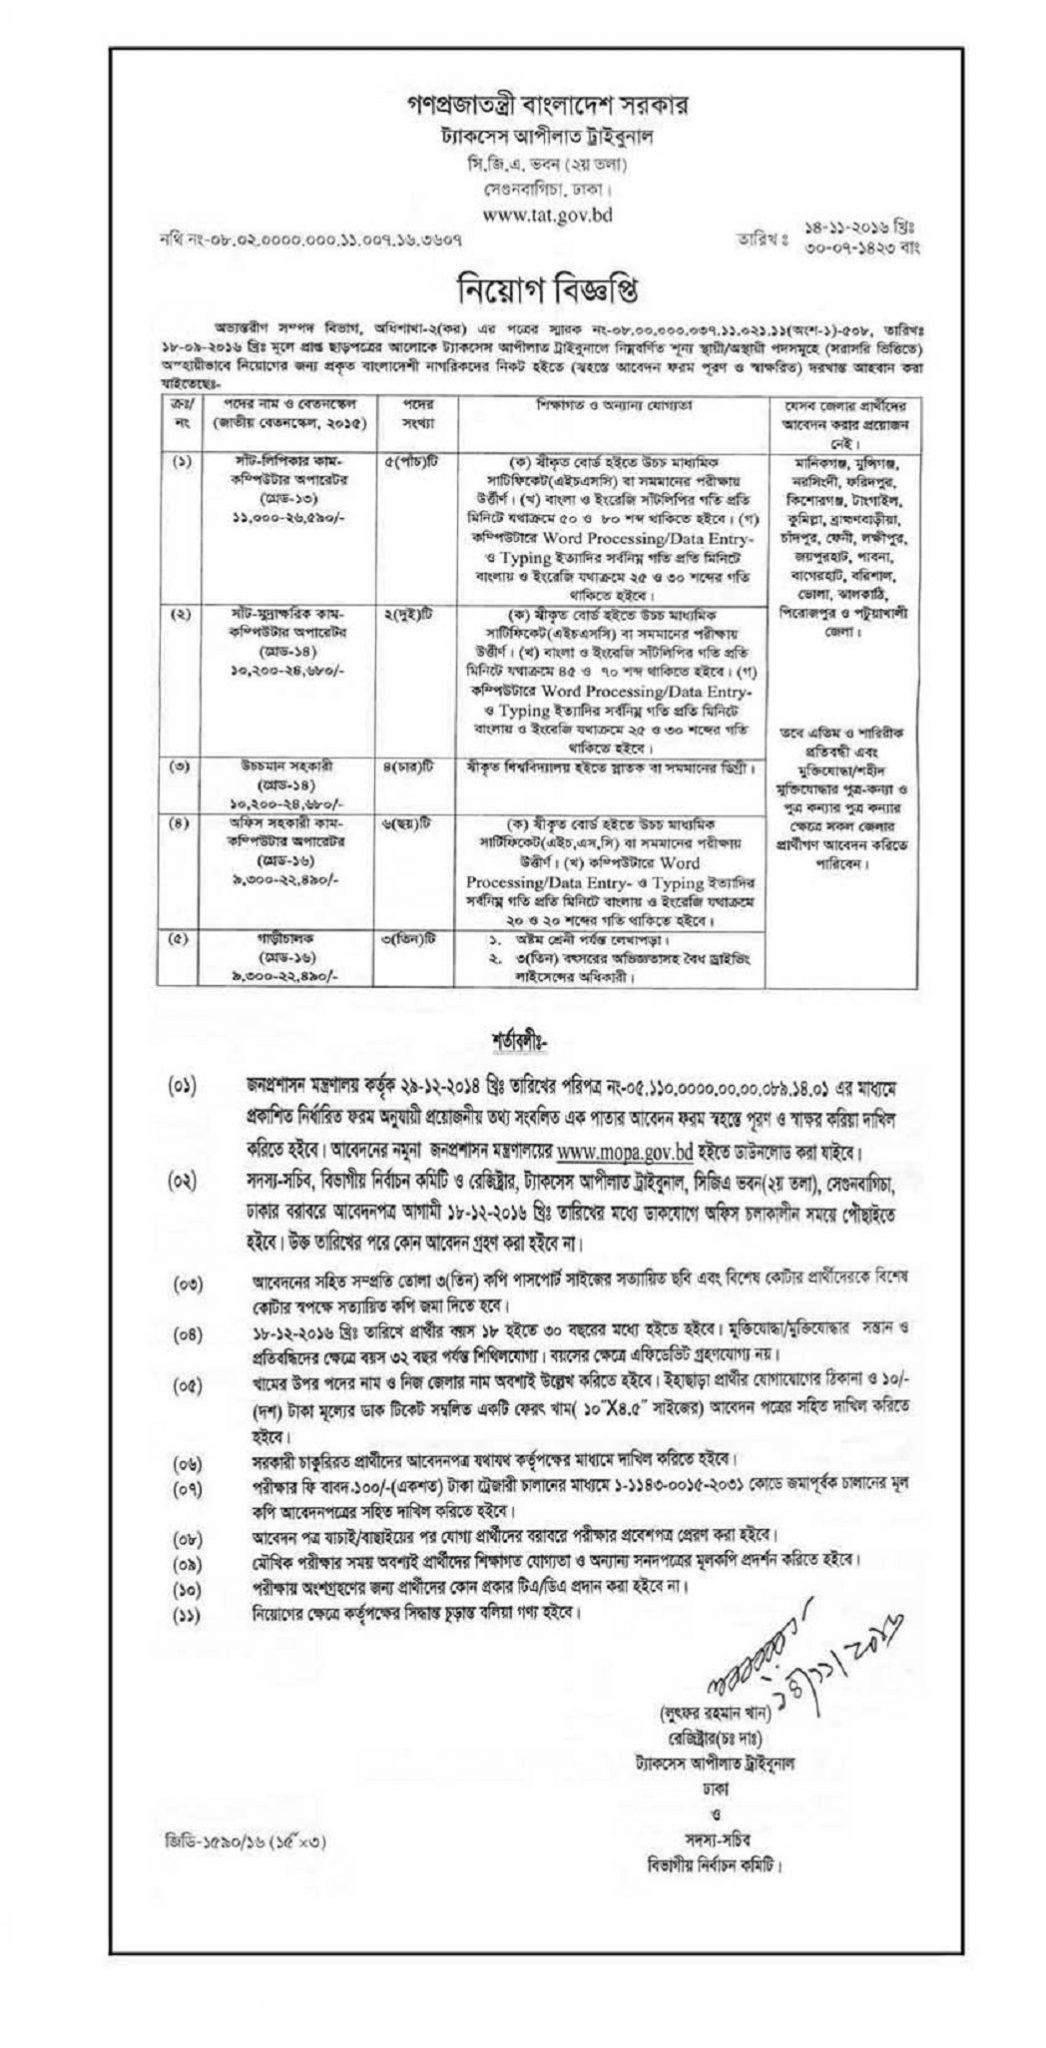 Government Taxes Appellate Tribunal Job Circular November 2016